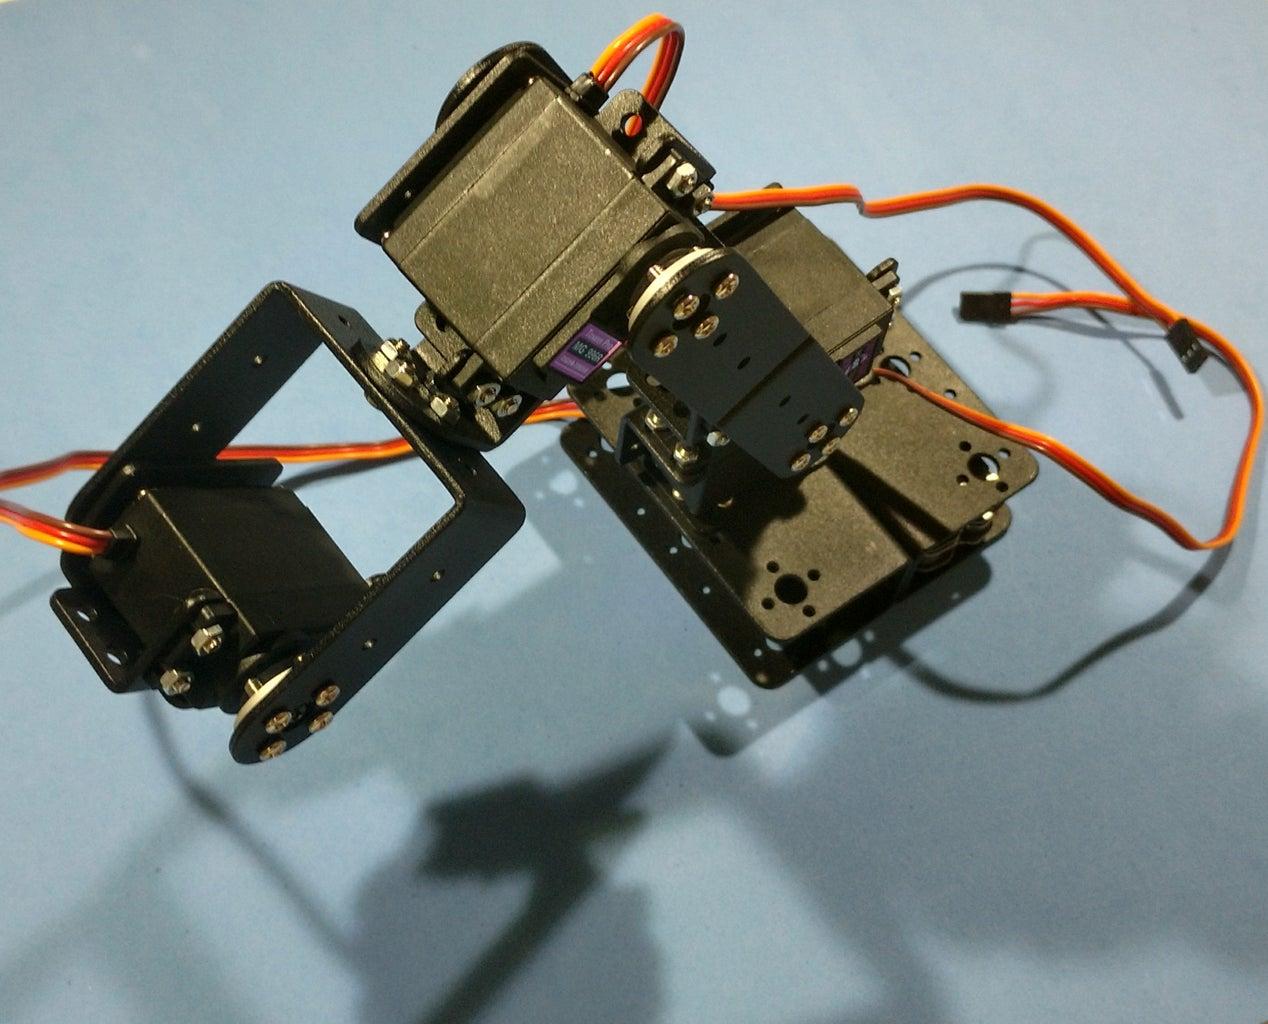 Assembling the Robotic Arm Pt5 - Servo #4